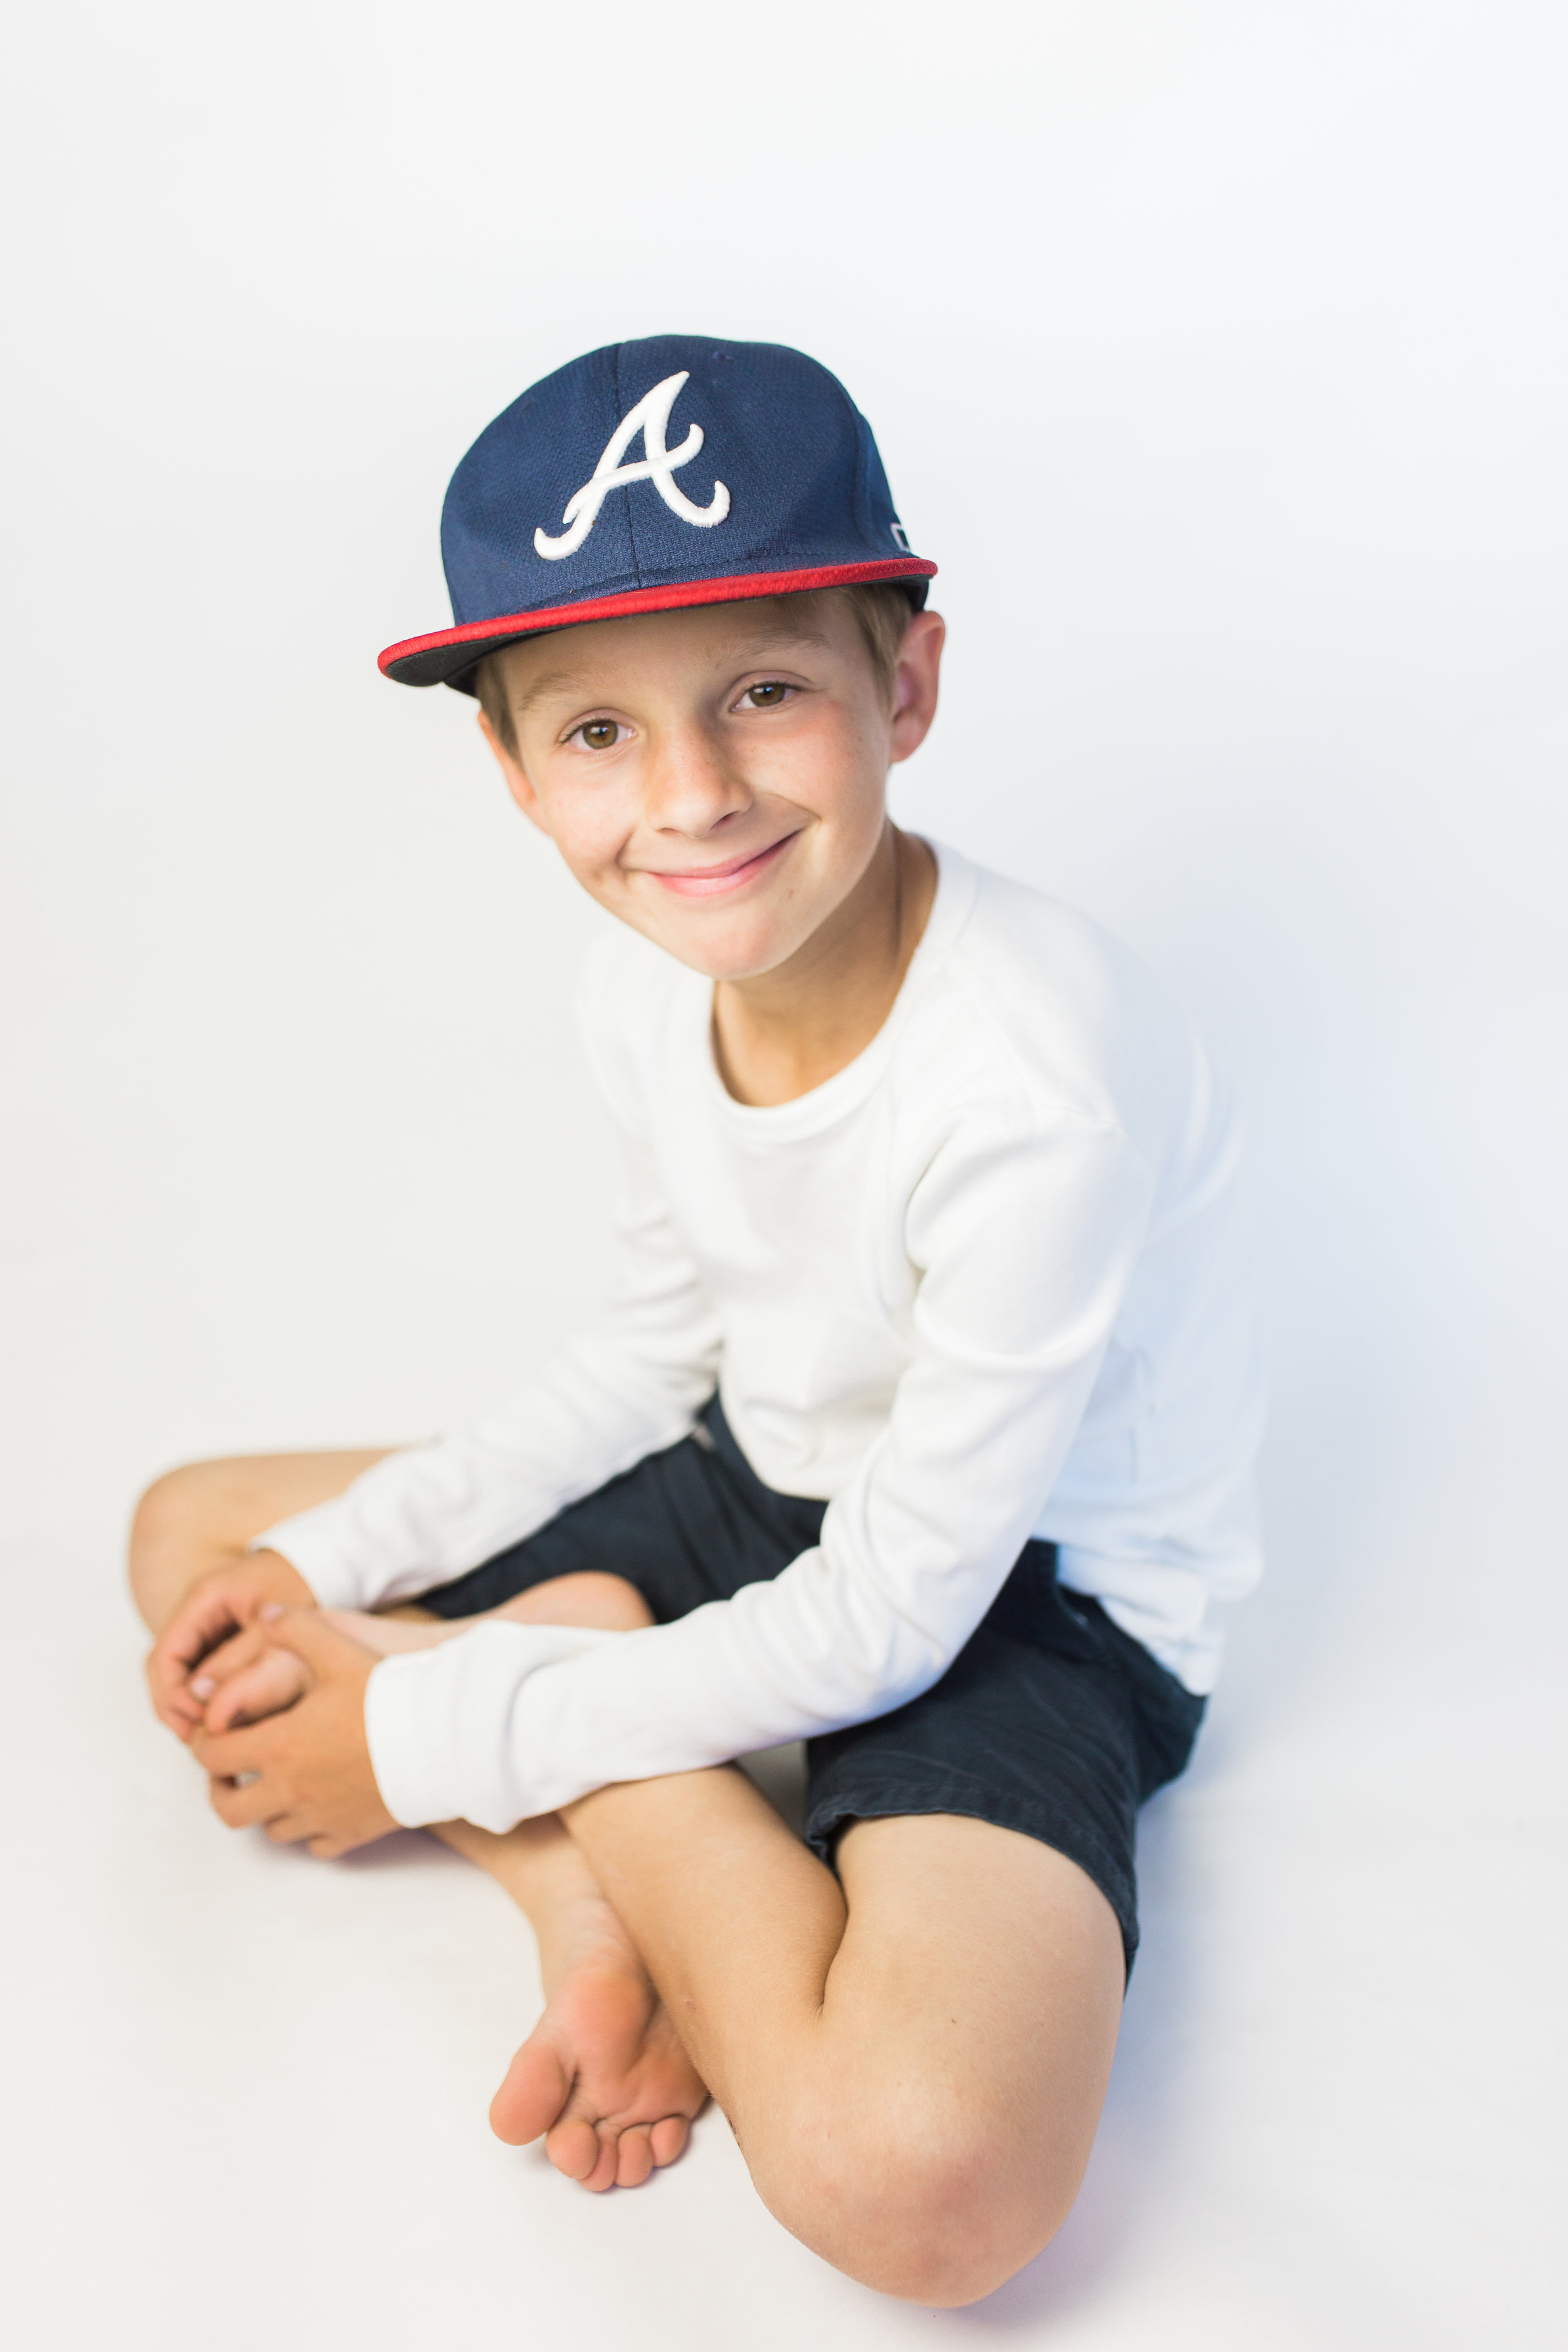 Orange County Childrens Photographer - Poppy lea Photography